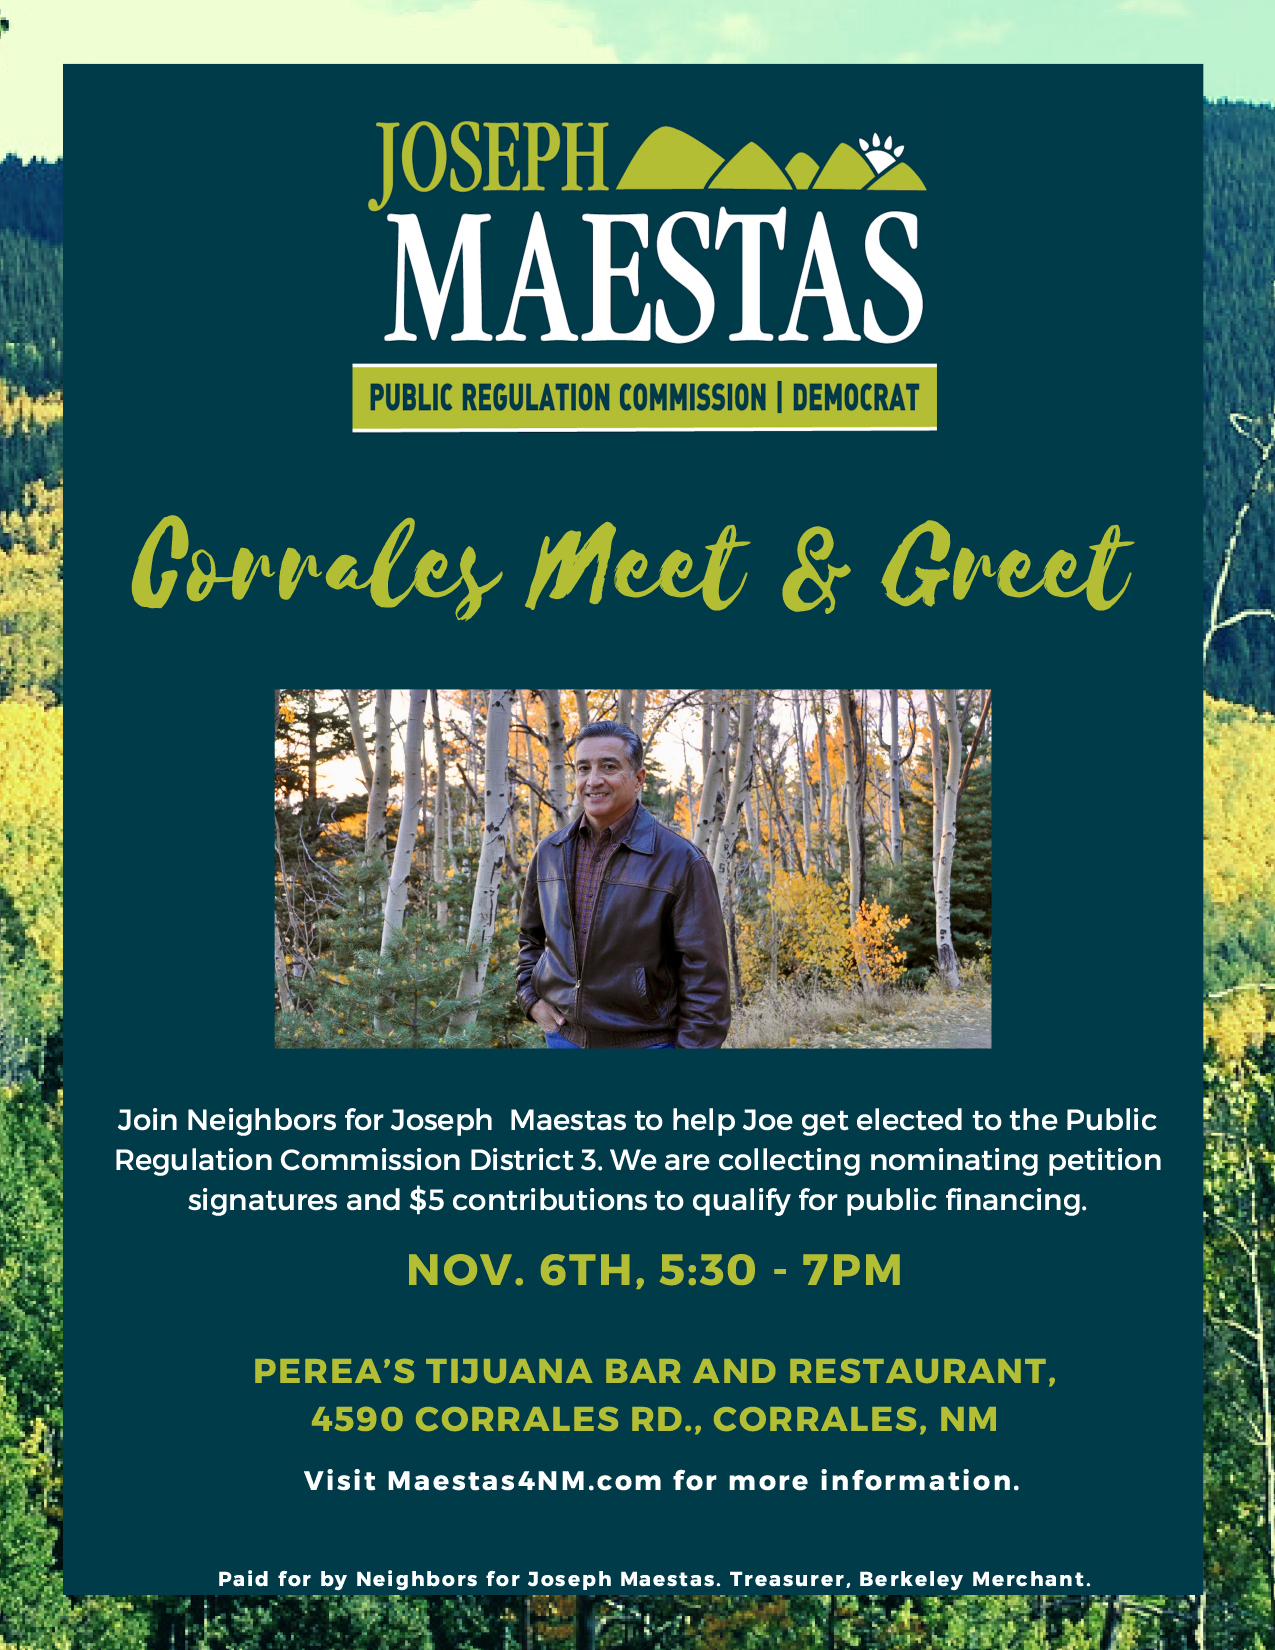 Joseph Maestas Corrales Meet and Greet @ PEREA'S TIJUANA BAR AND RESTAURANT | Corrales | New Mexico | United States